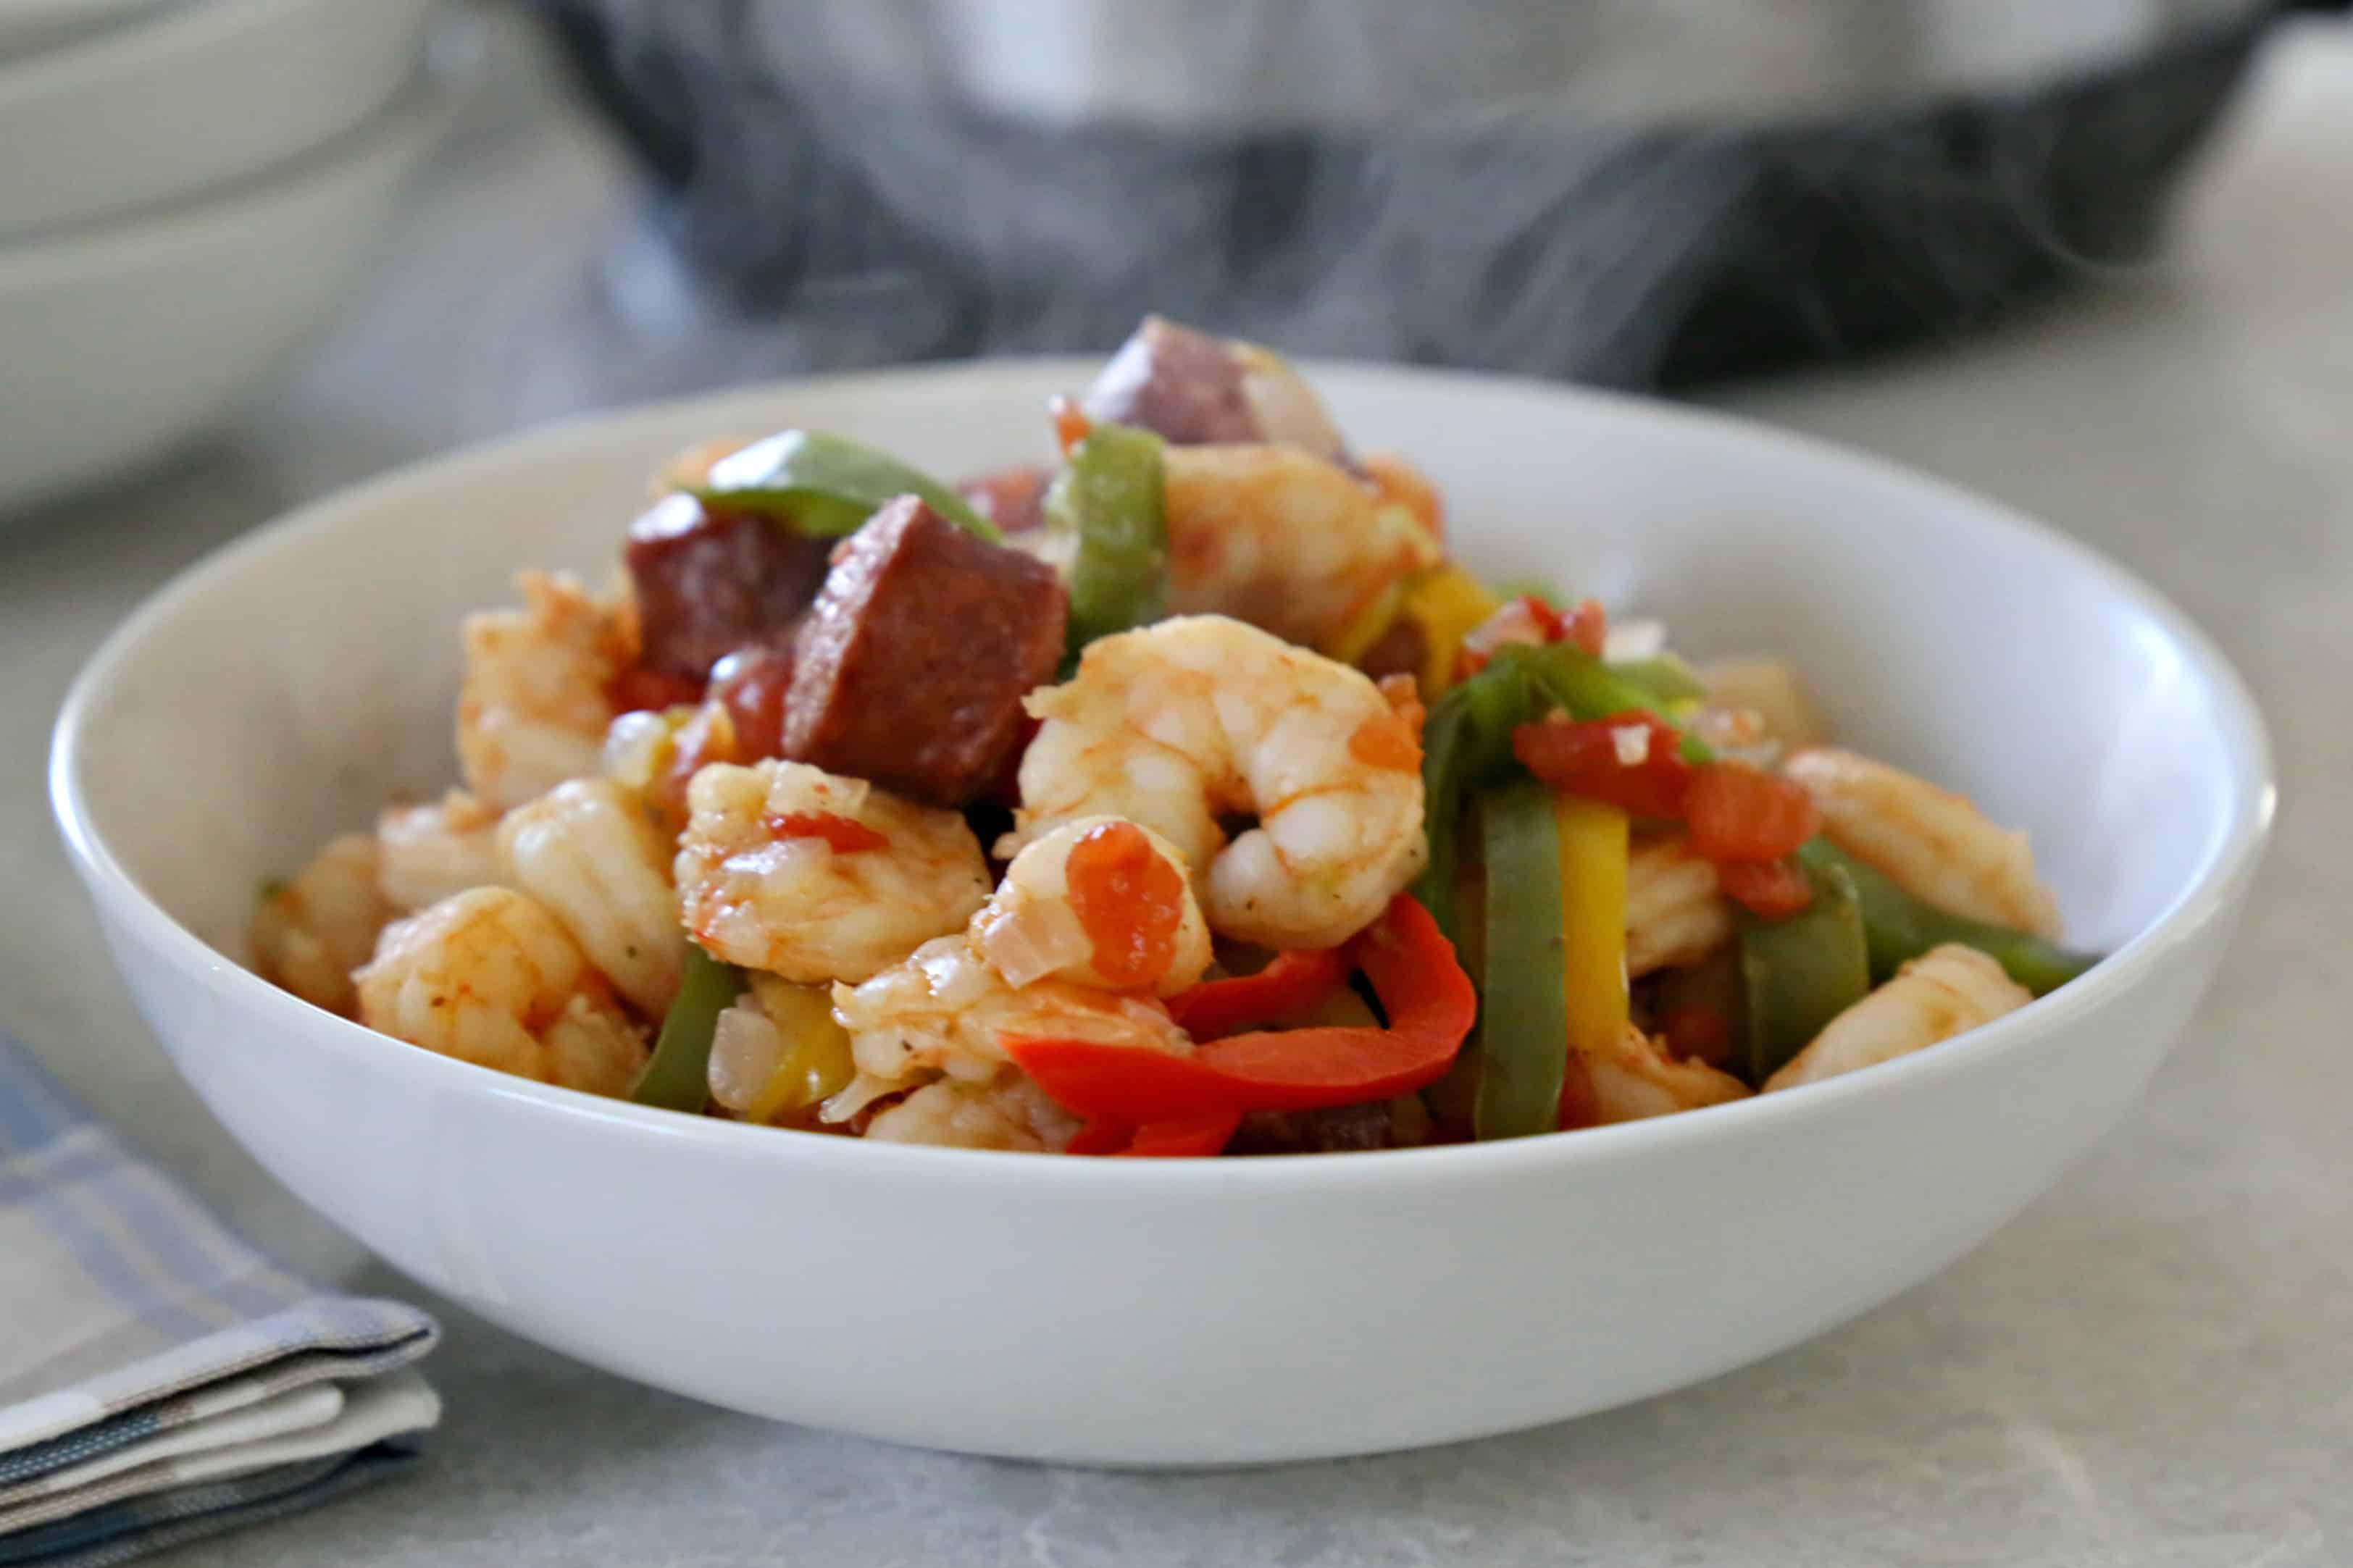 Shrimp, Smoked Sausage, and Peppers